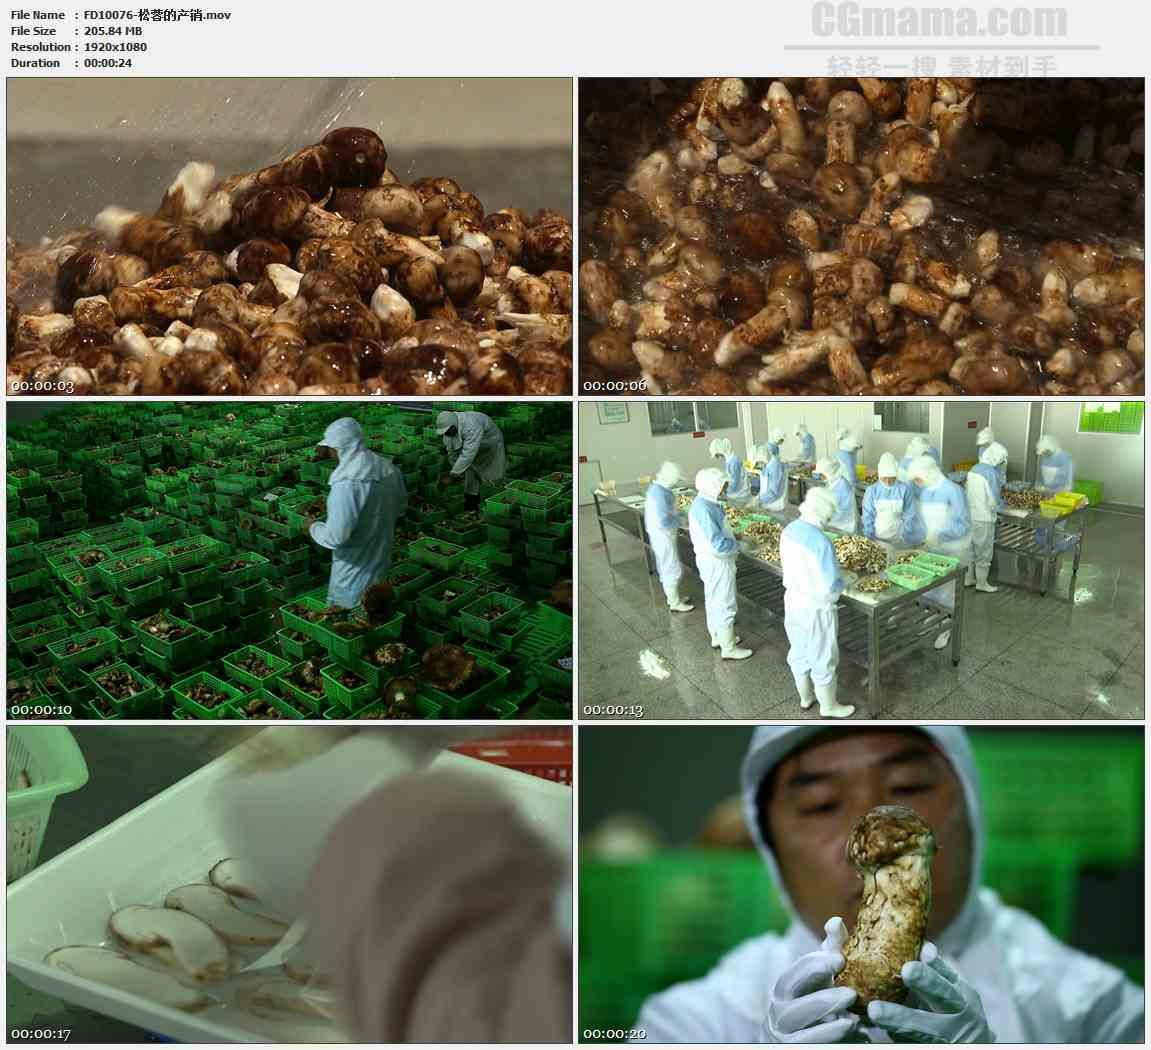 FD10076-野蘑菇洗蘑菇松茸加工产销生产高清实拍视频素材